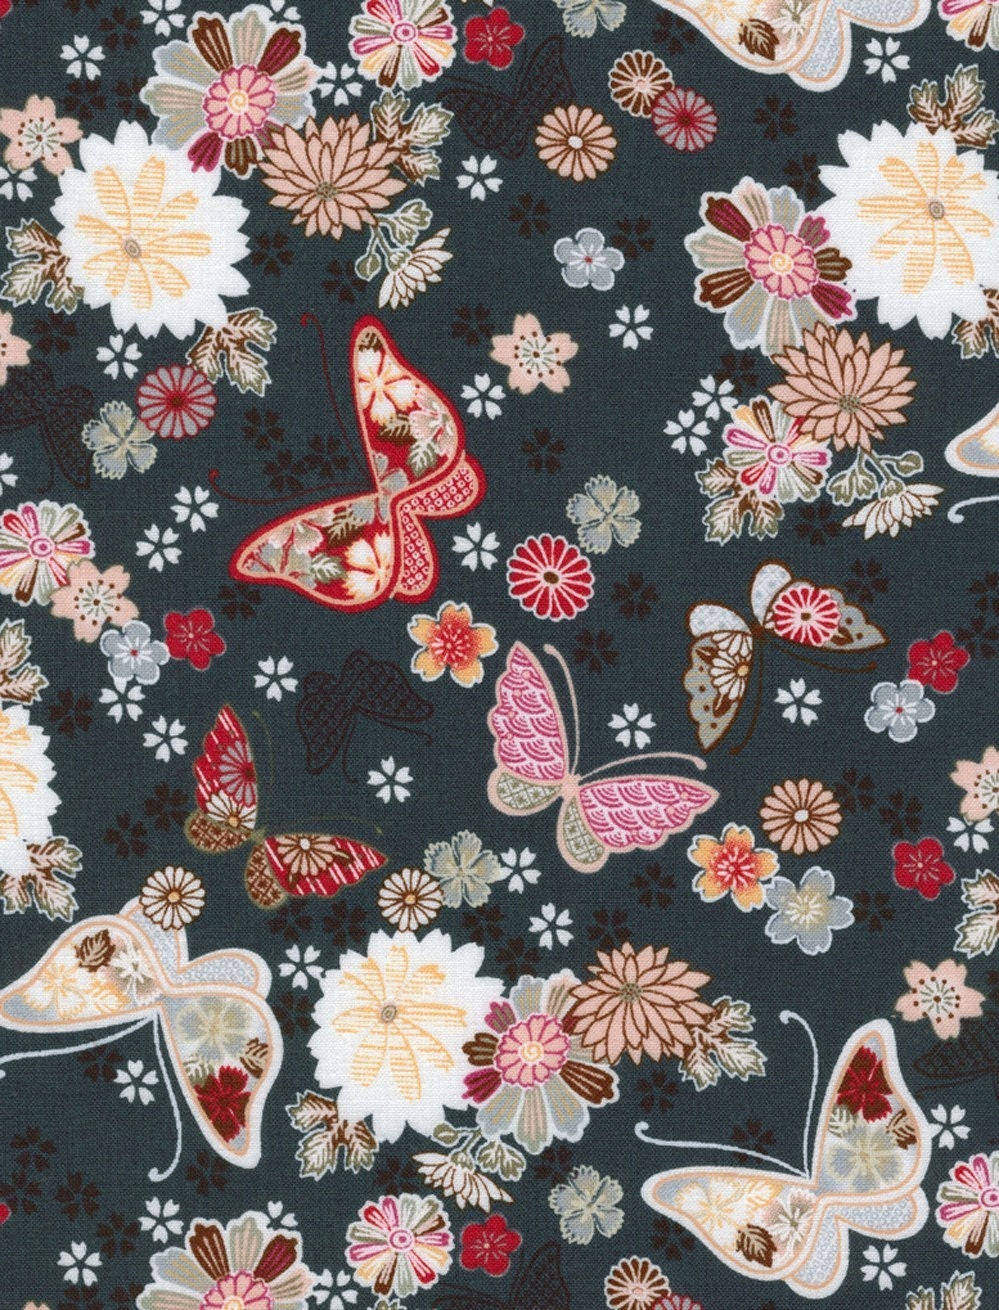 Flowers and Butterflies on Dark Blue - Japanese Fabric Fat Quarter